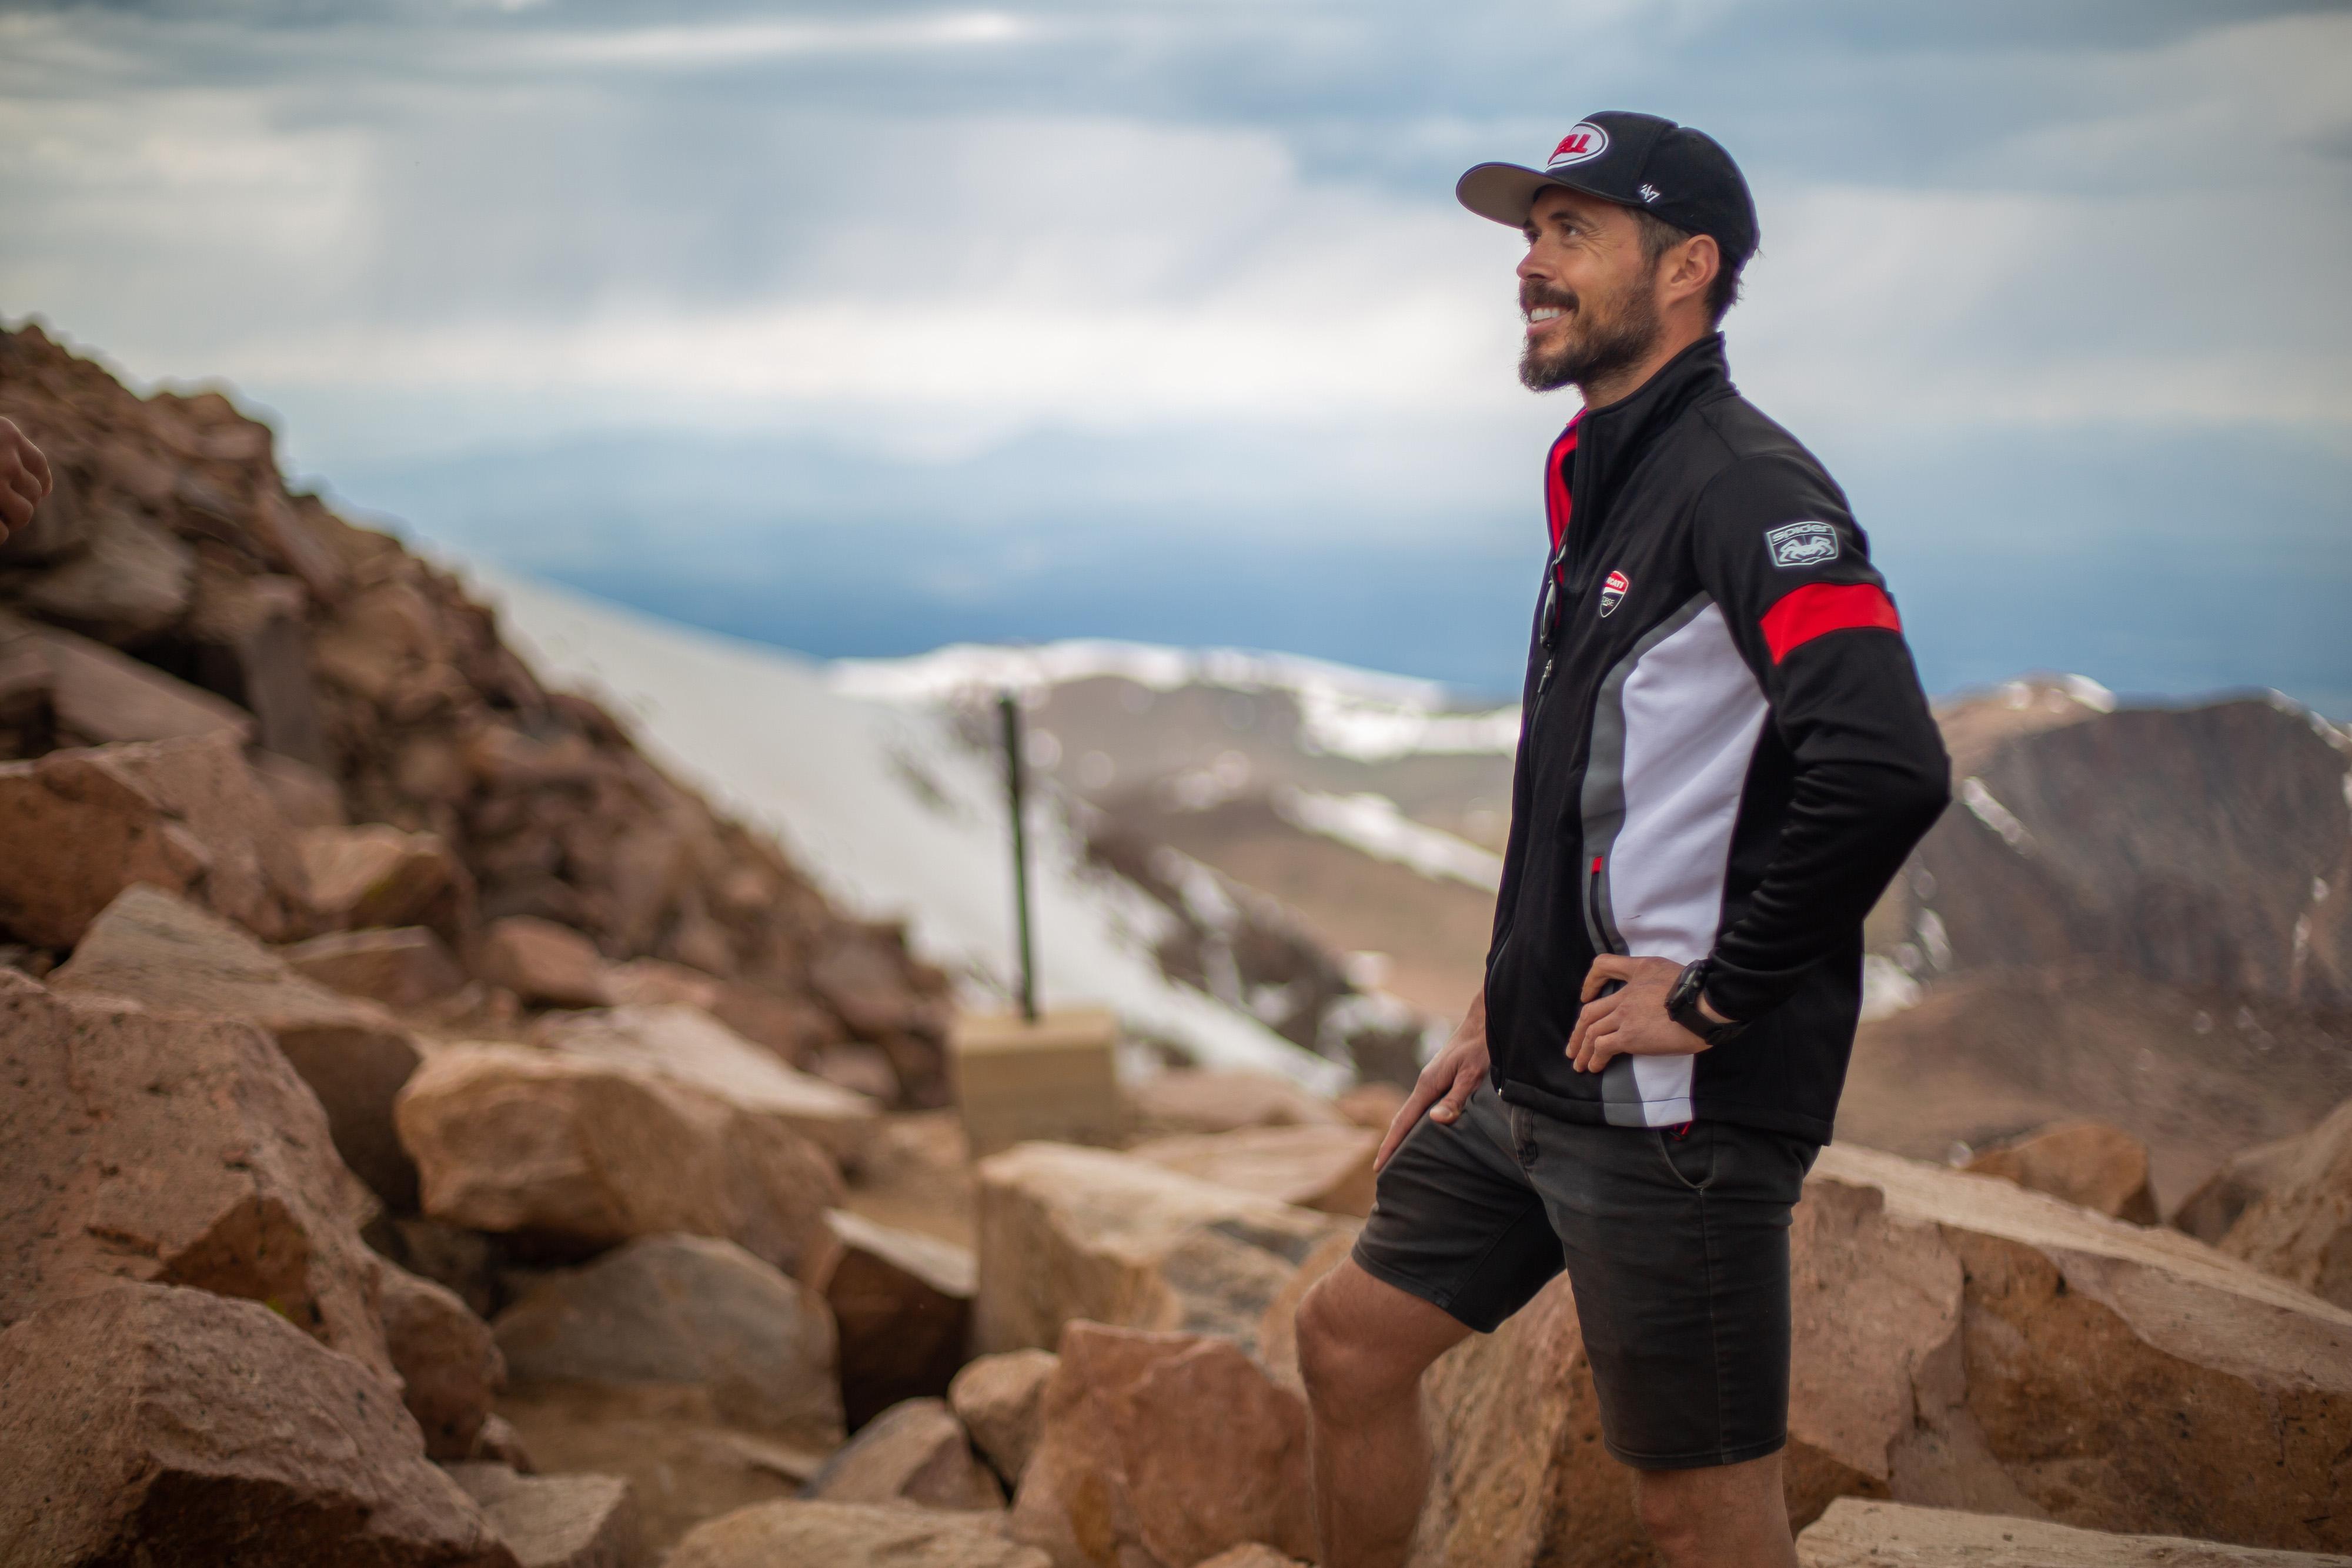 PPIHC e a Ducati North America recolhem fundos para a família de Carlin Dunne